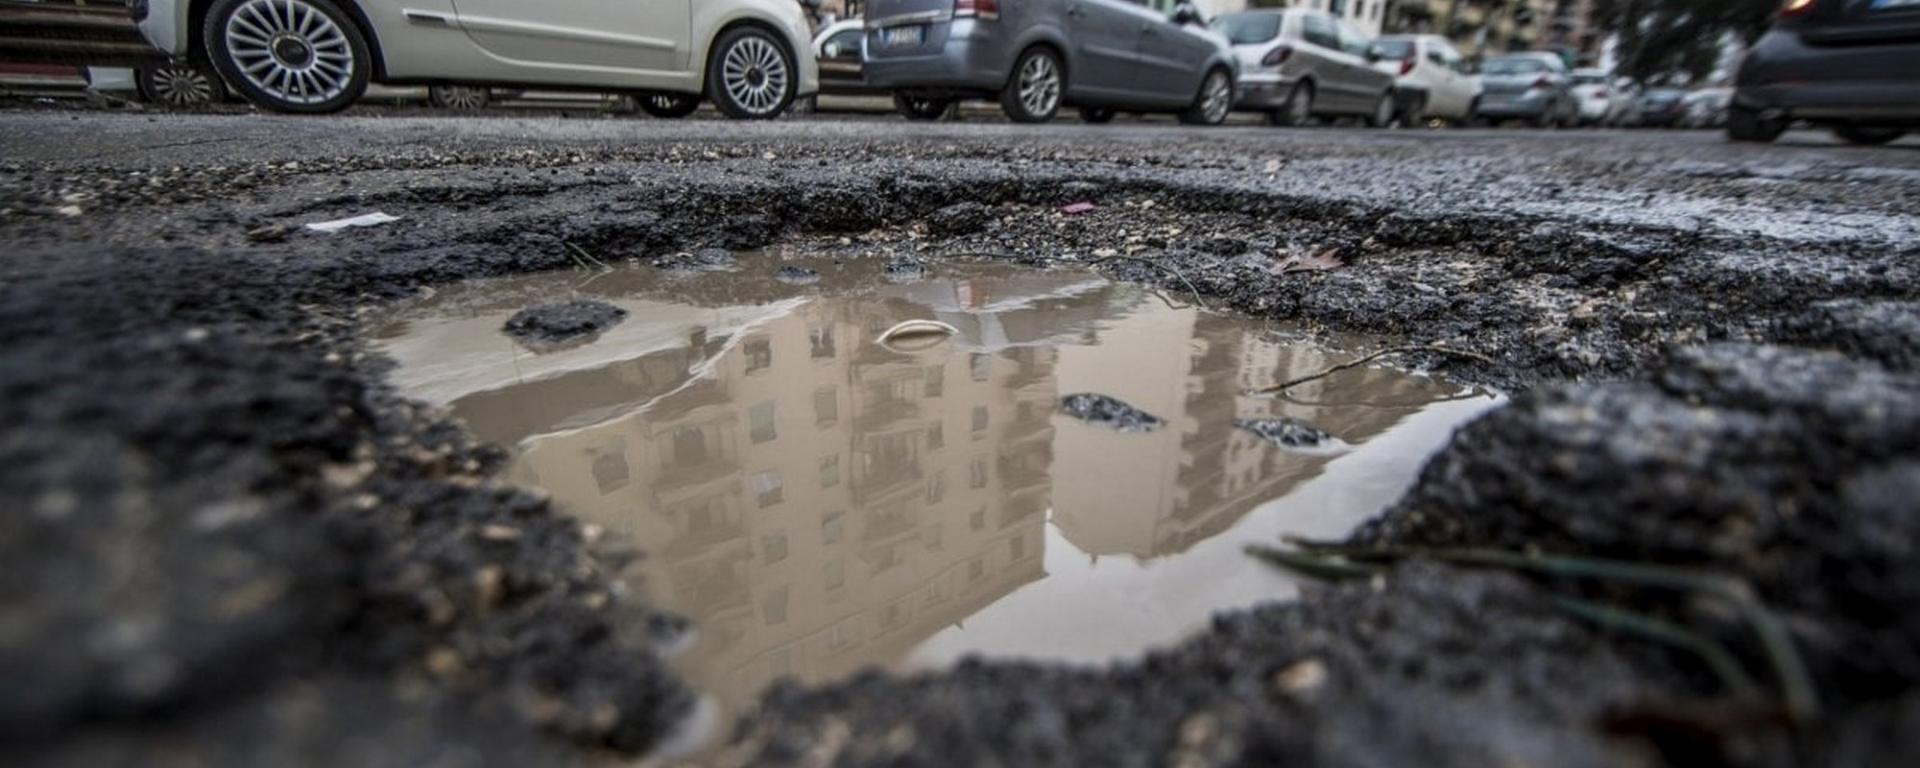 Risarcimento Danni insidie stradali